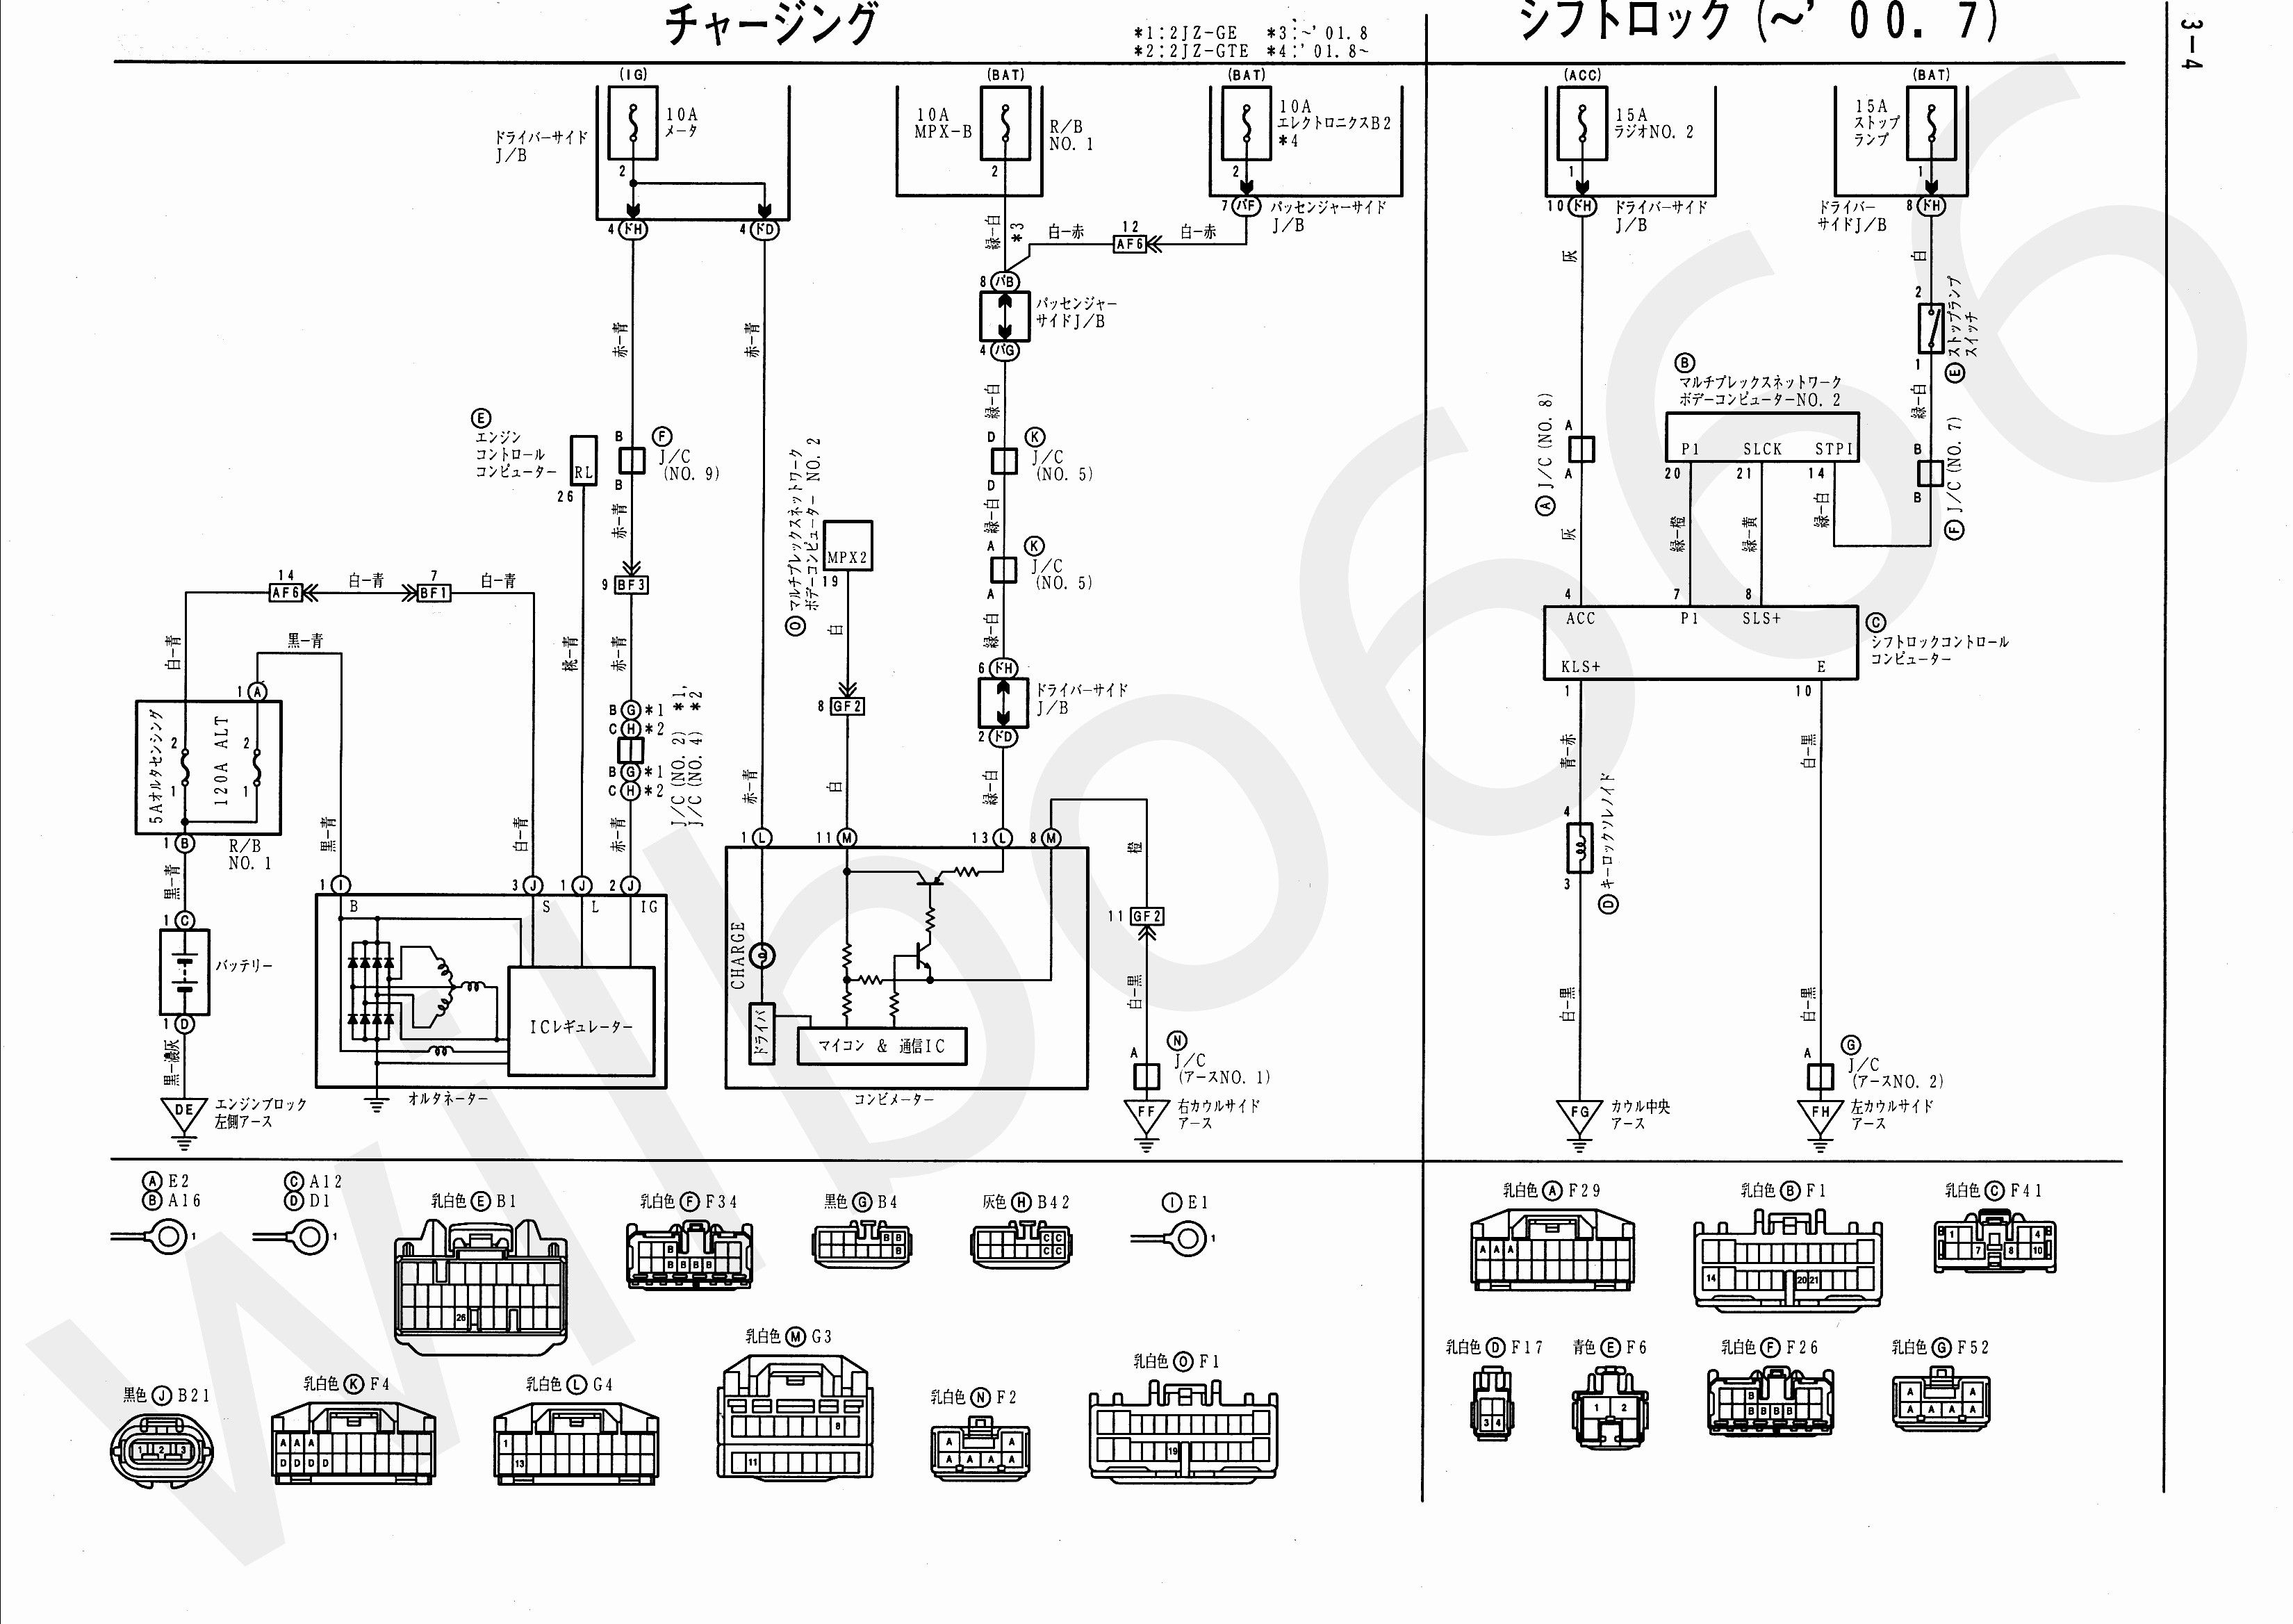 Inspirational Toyota Wiring Diagram Abbreviations  Diagrams  Digramssample  Diagramimages